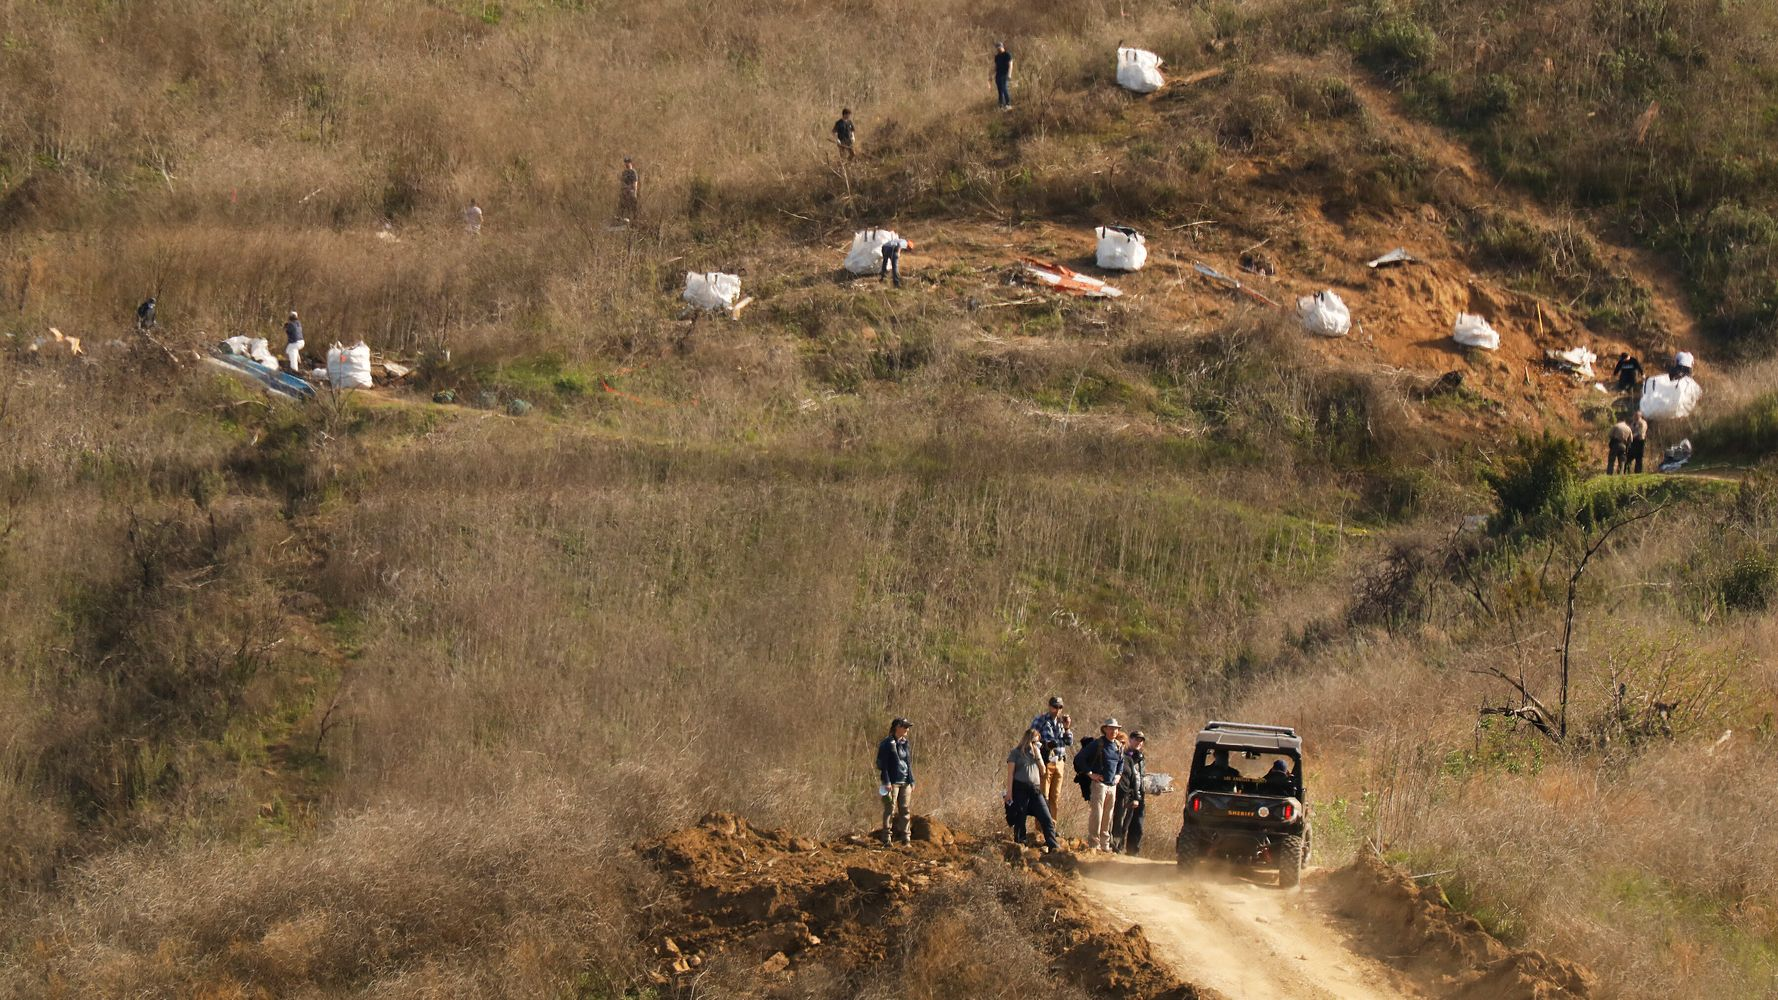 Westlake Legal Group 5e3f2b6b270000ea0738b940 New Details Released On Kobe Bryant Helicopter Crash